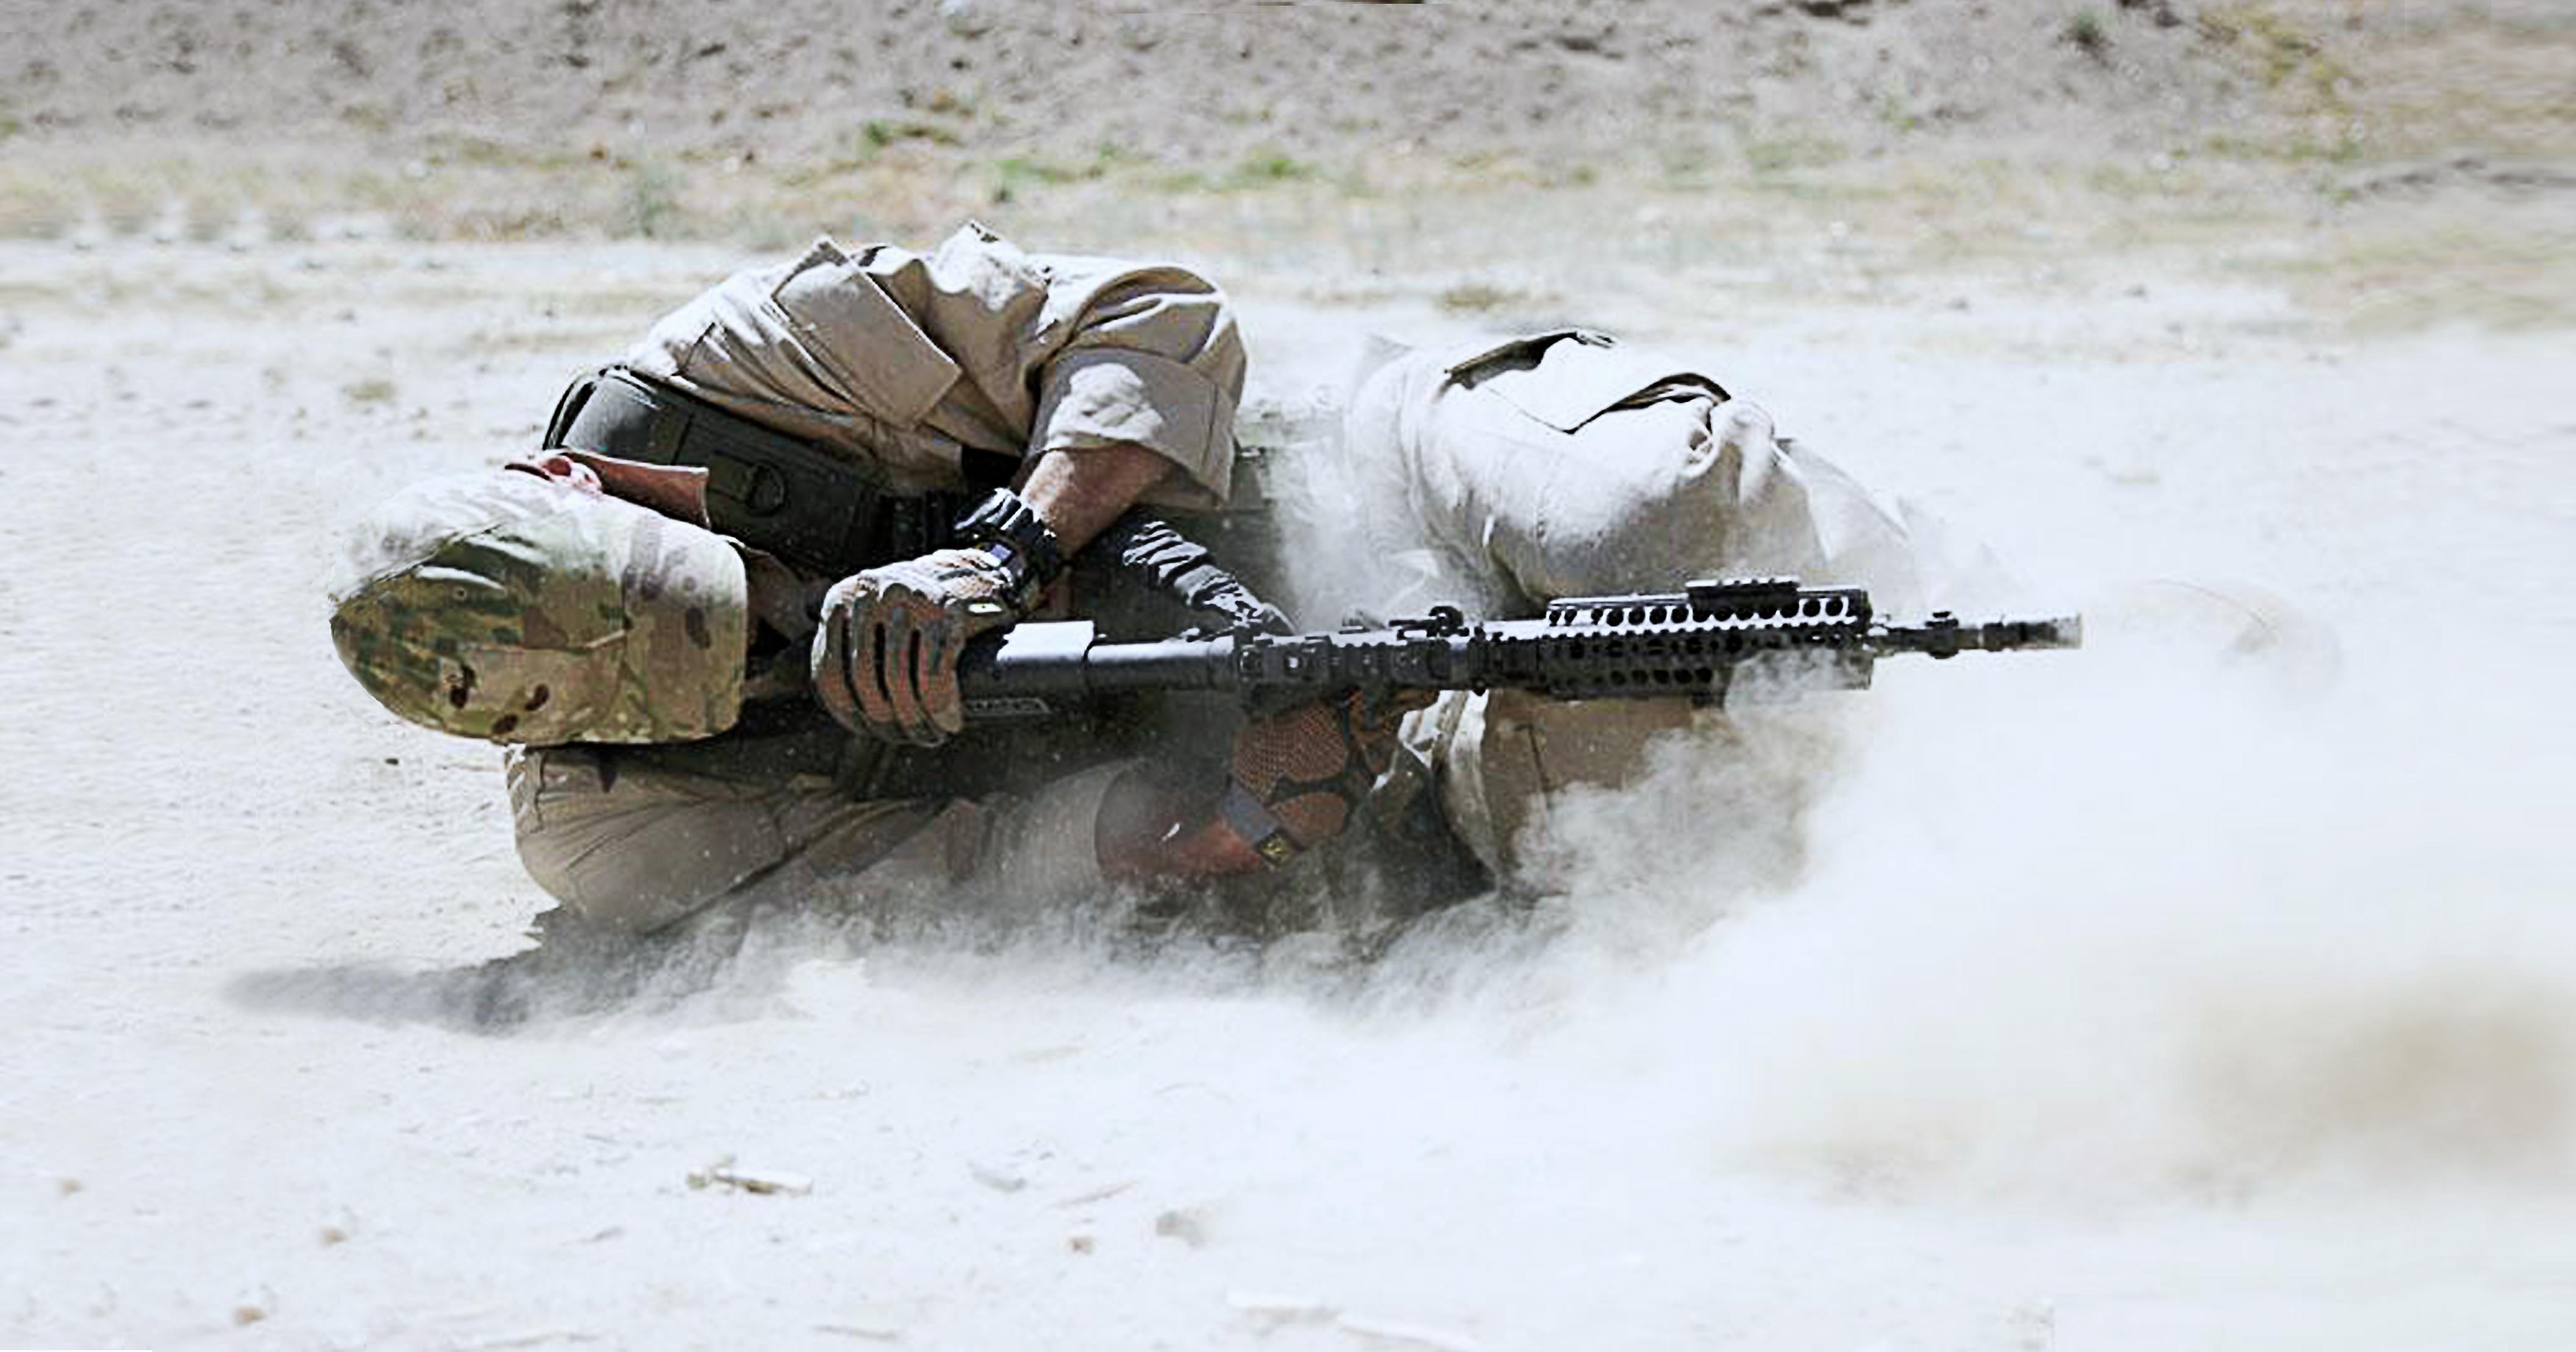 Navy Seals Bud S Training